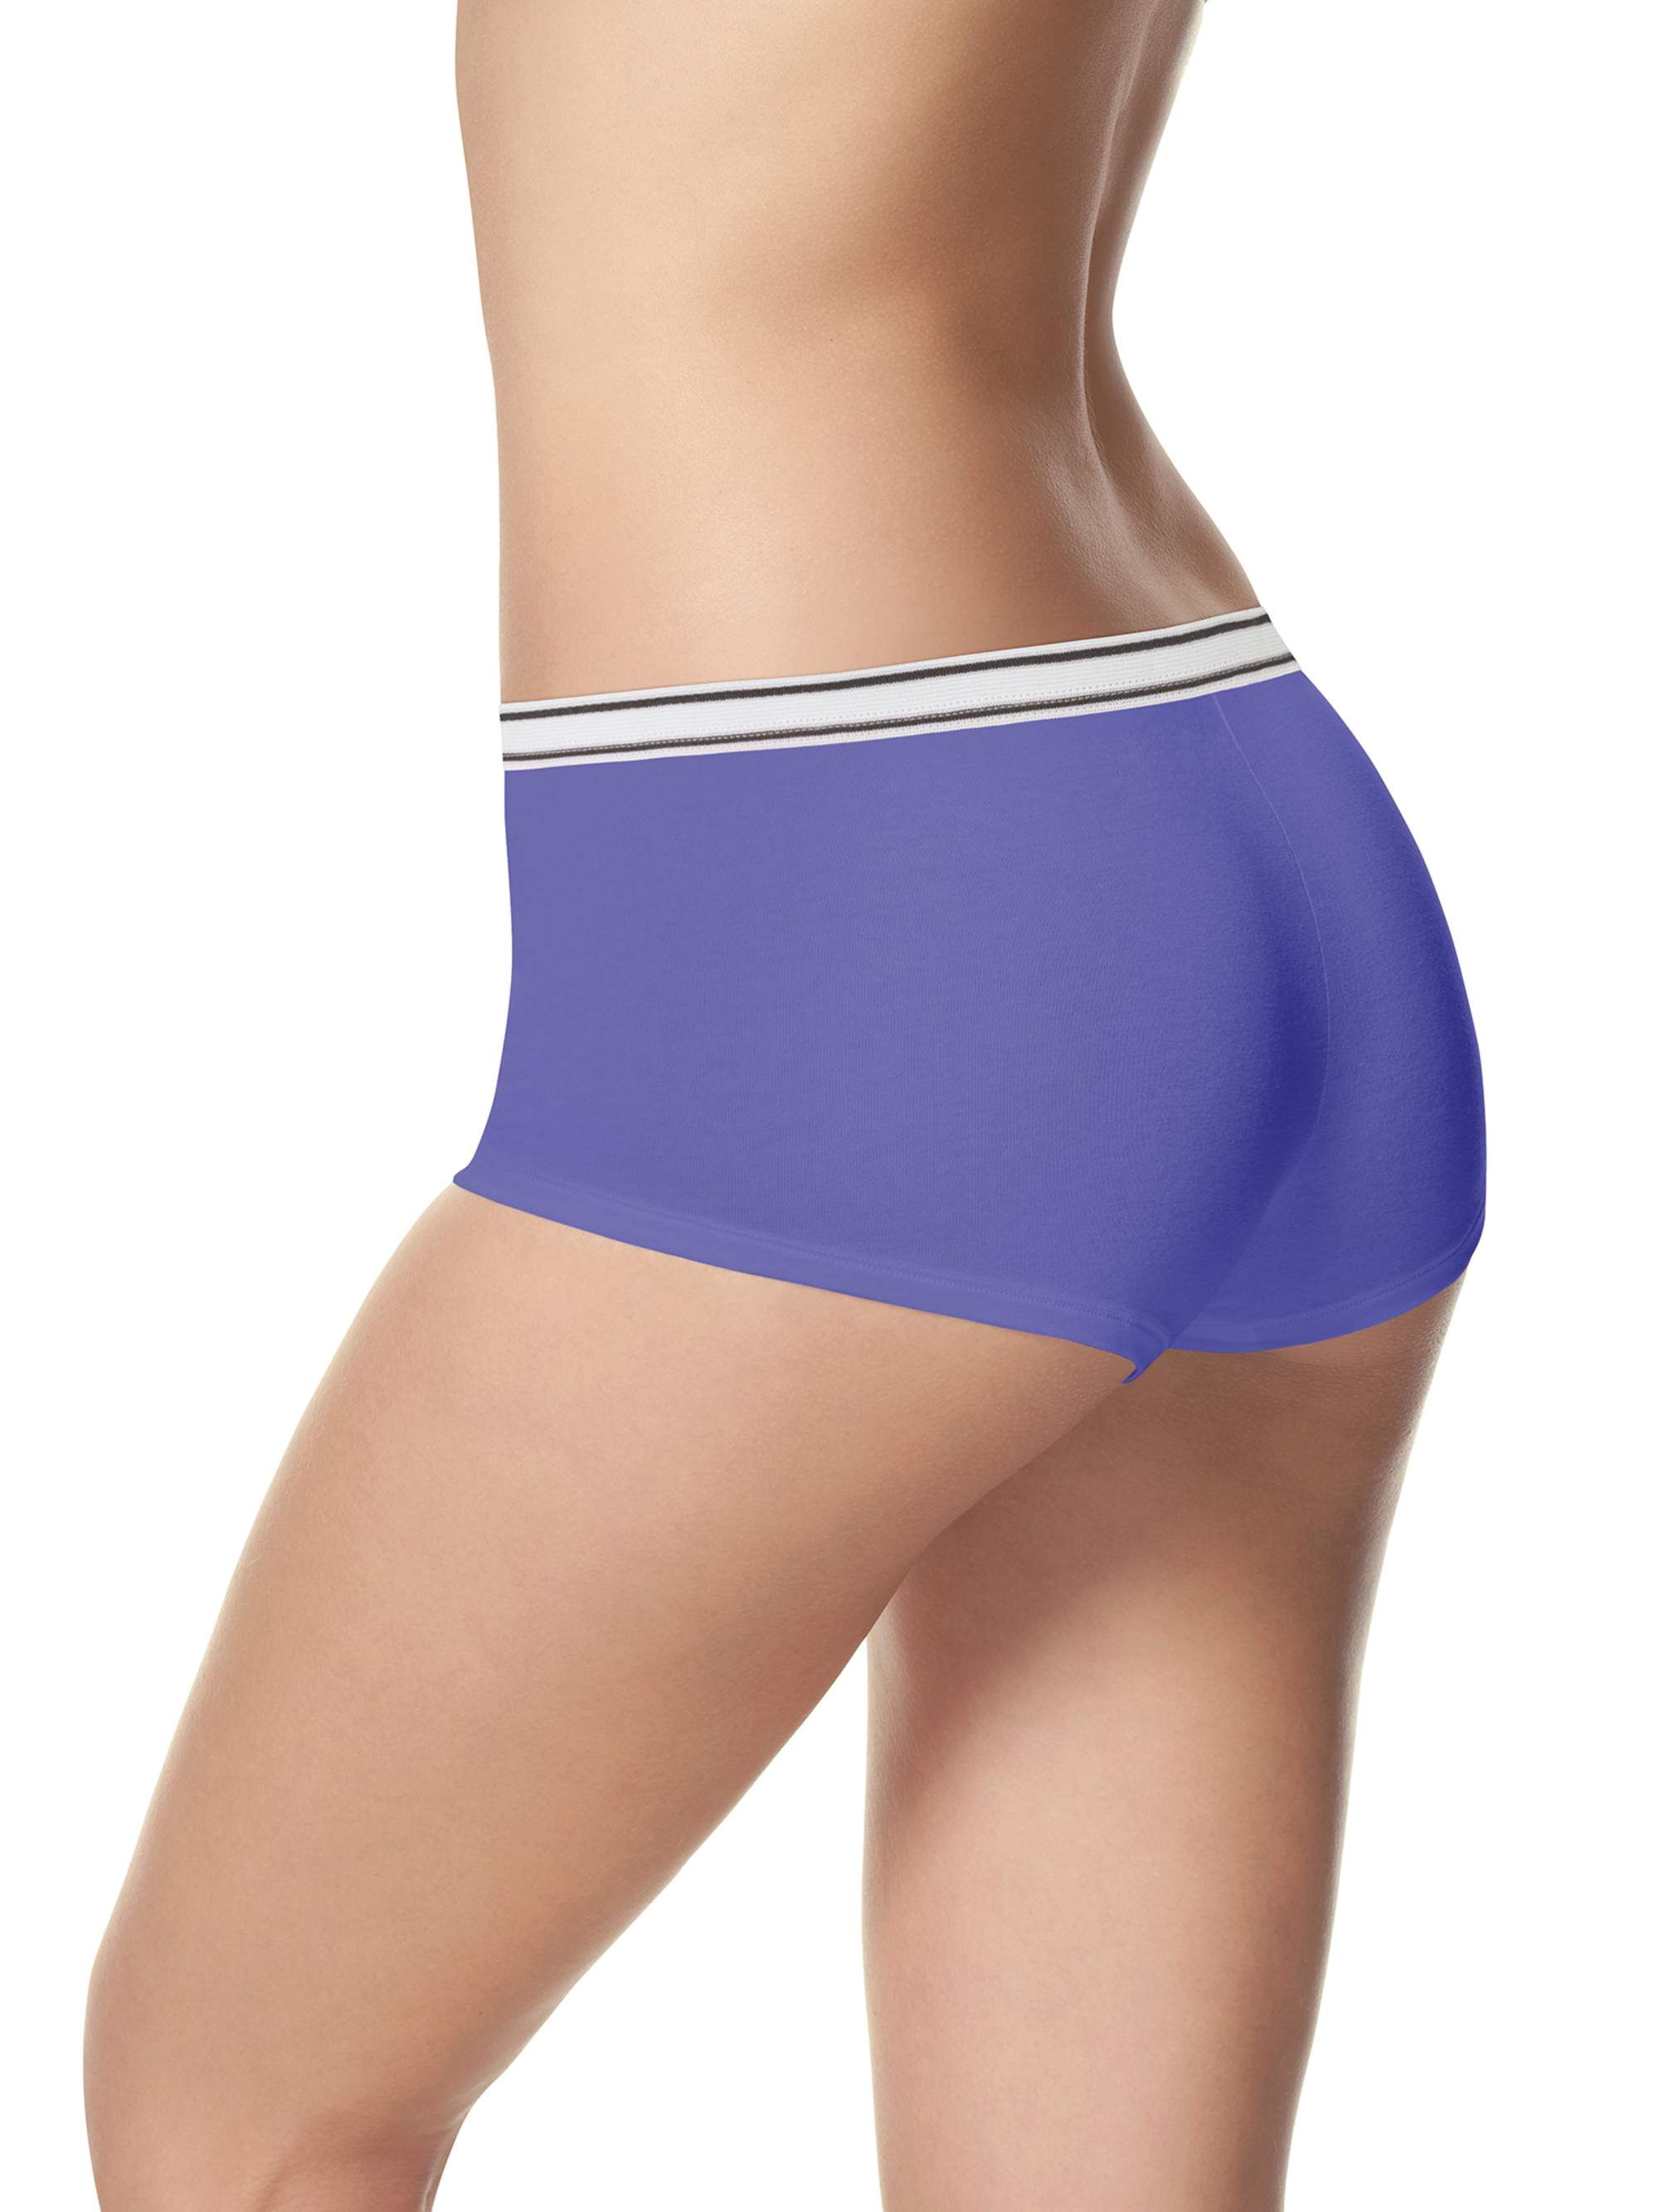 Women's Cotton Sporty Boyshort Panties - 6+2 Bonus Pack